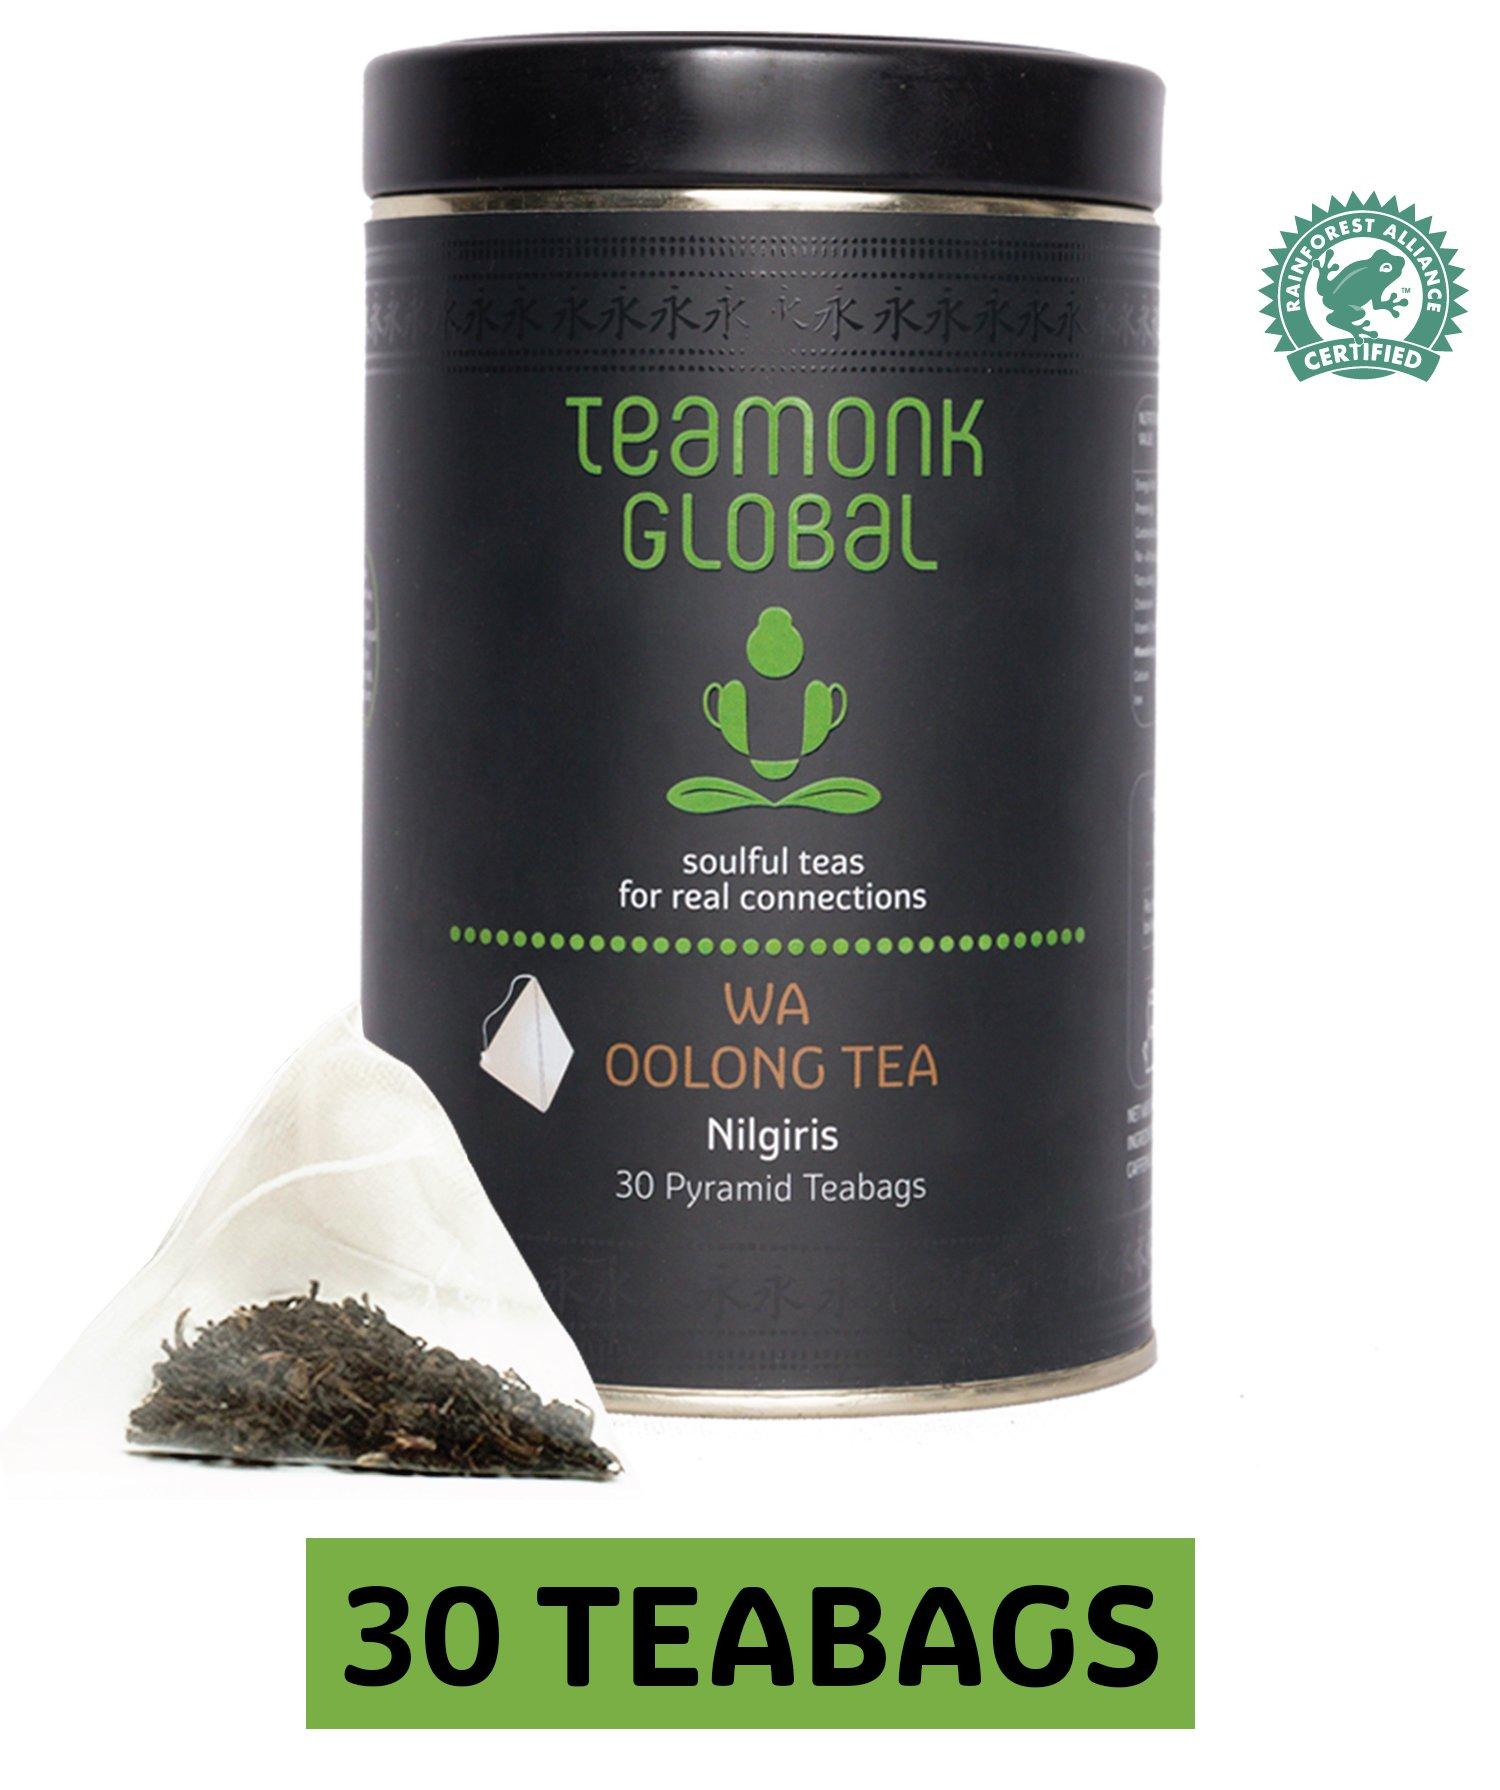 Teamonk Nilgiri Oolong Tea, 30 Teabags   100% Natural Whole Leaf Teabags for Weight Loss   Wa Oolong Tea  No Additives